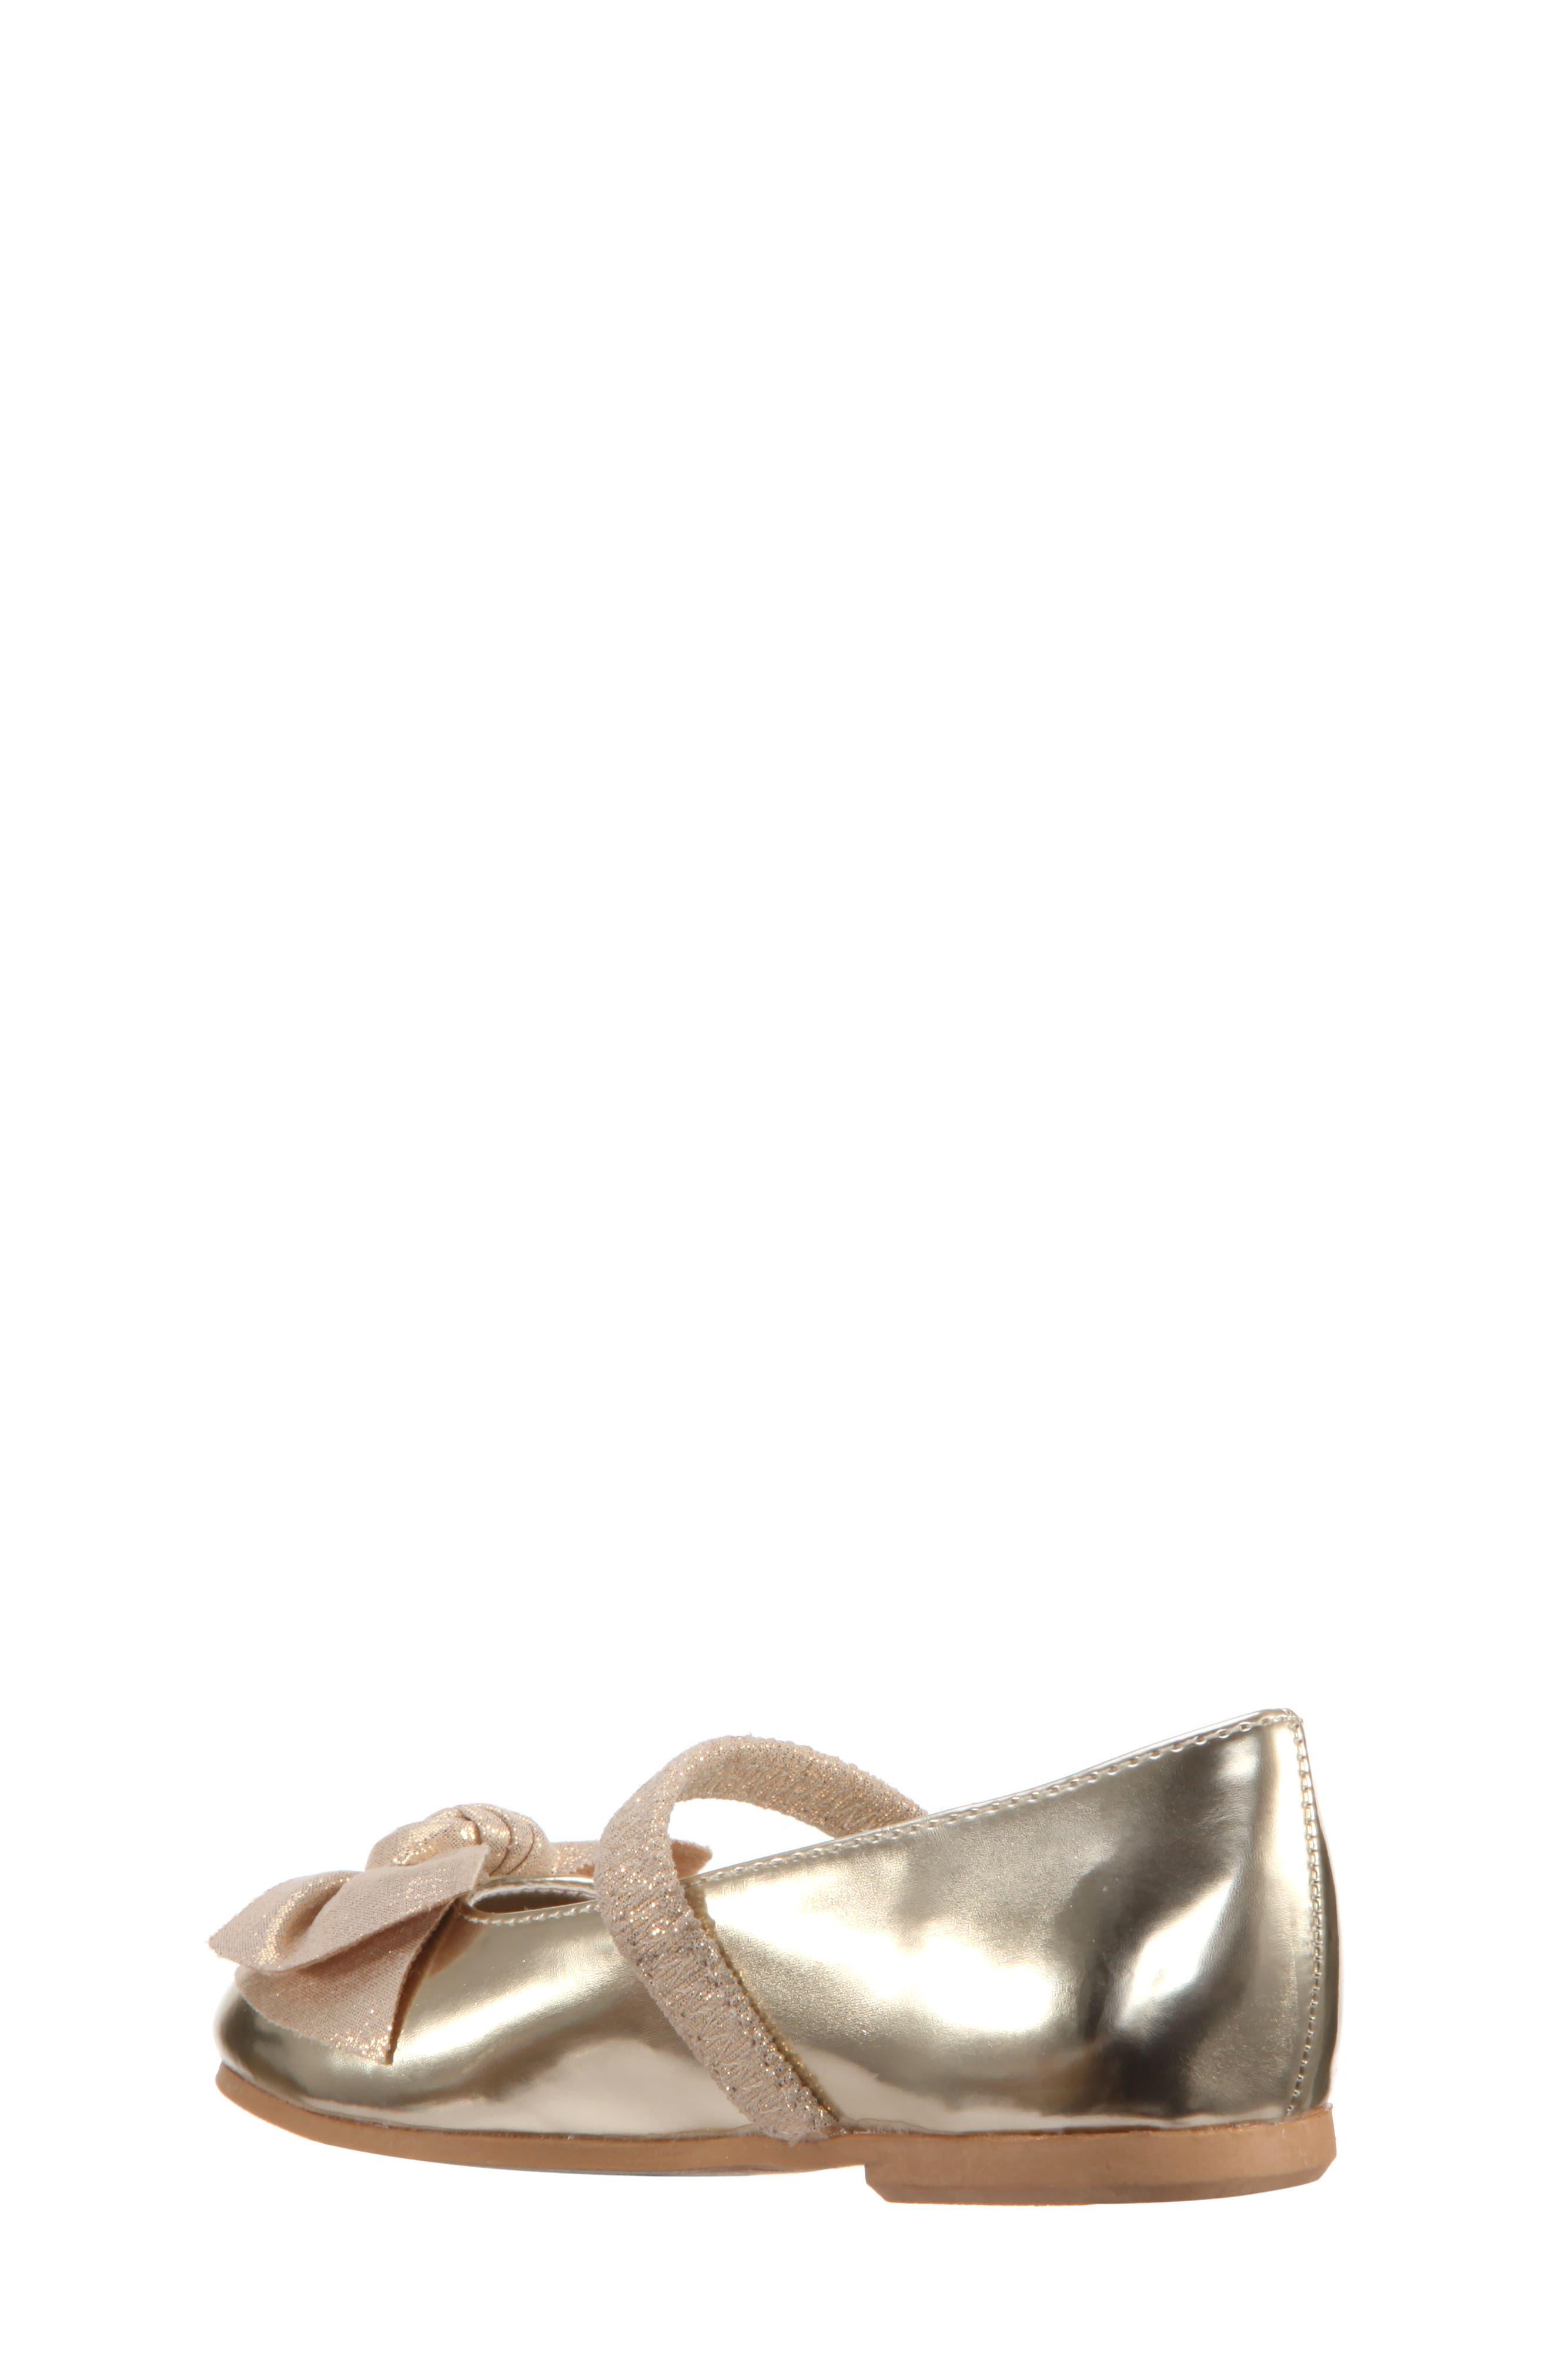 Kaytelyn-T Glitter Bow Ballet Flat,                             Alternate thumbnail 13, color,